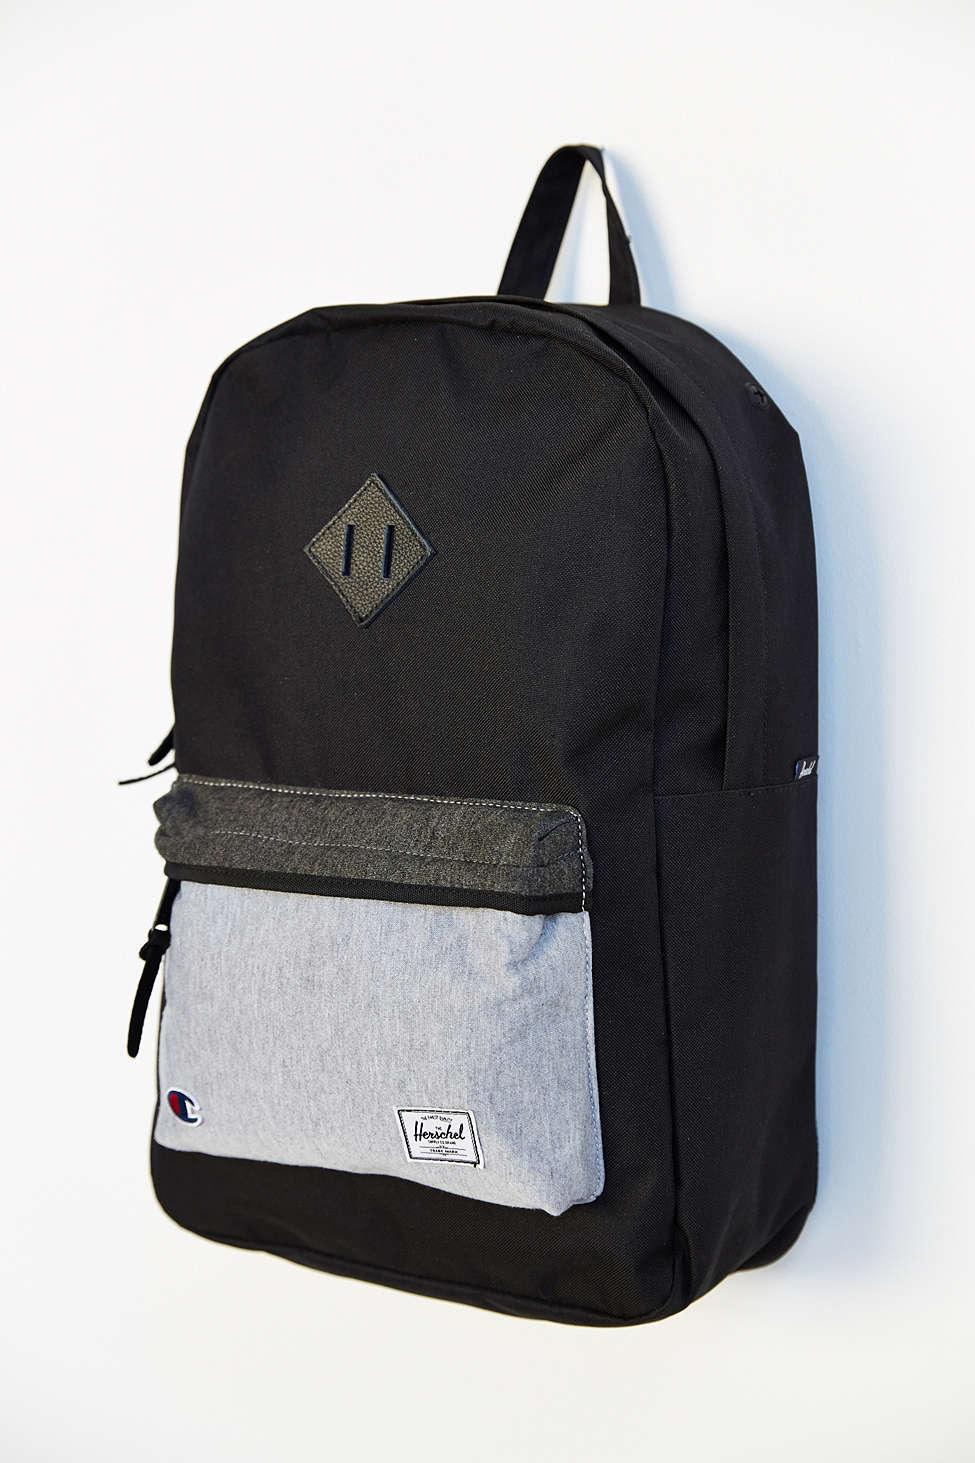 Herschel Supply Co. x Champion Backpack Blk